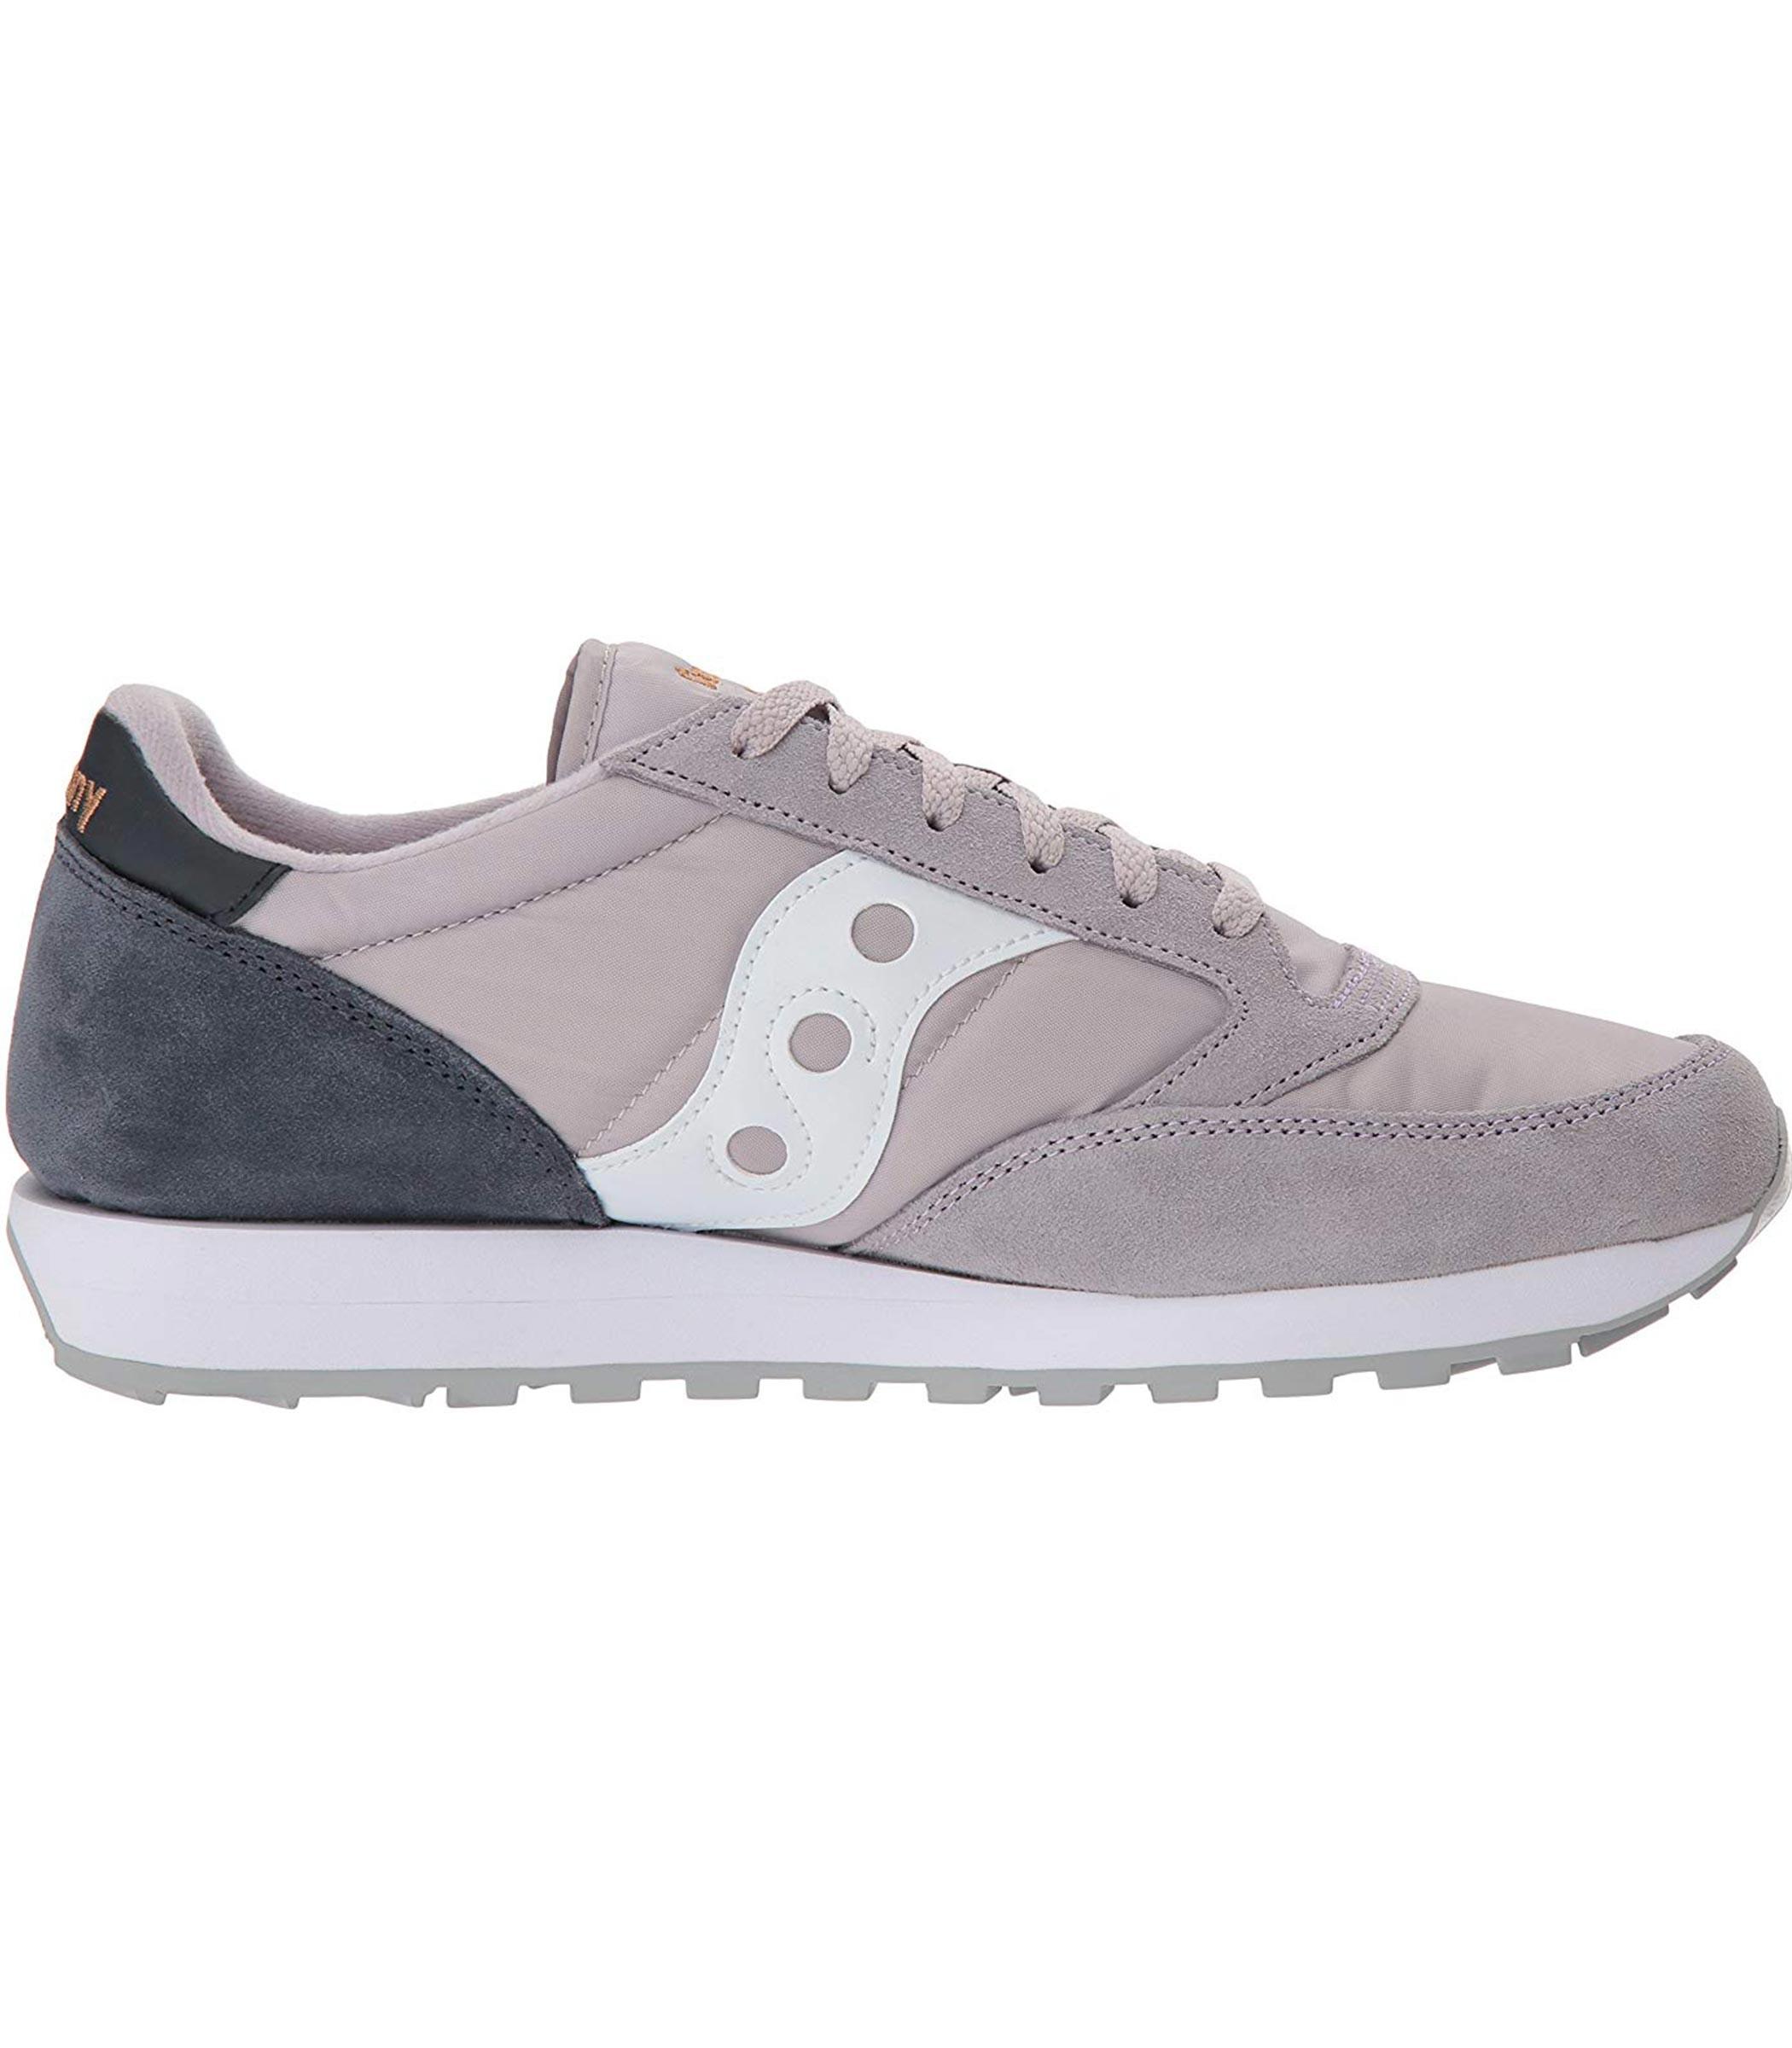 Scarpe Sneakers Saucony Jazz Original Uomo rif. S2044-451 28ed739e960